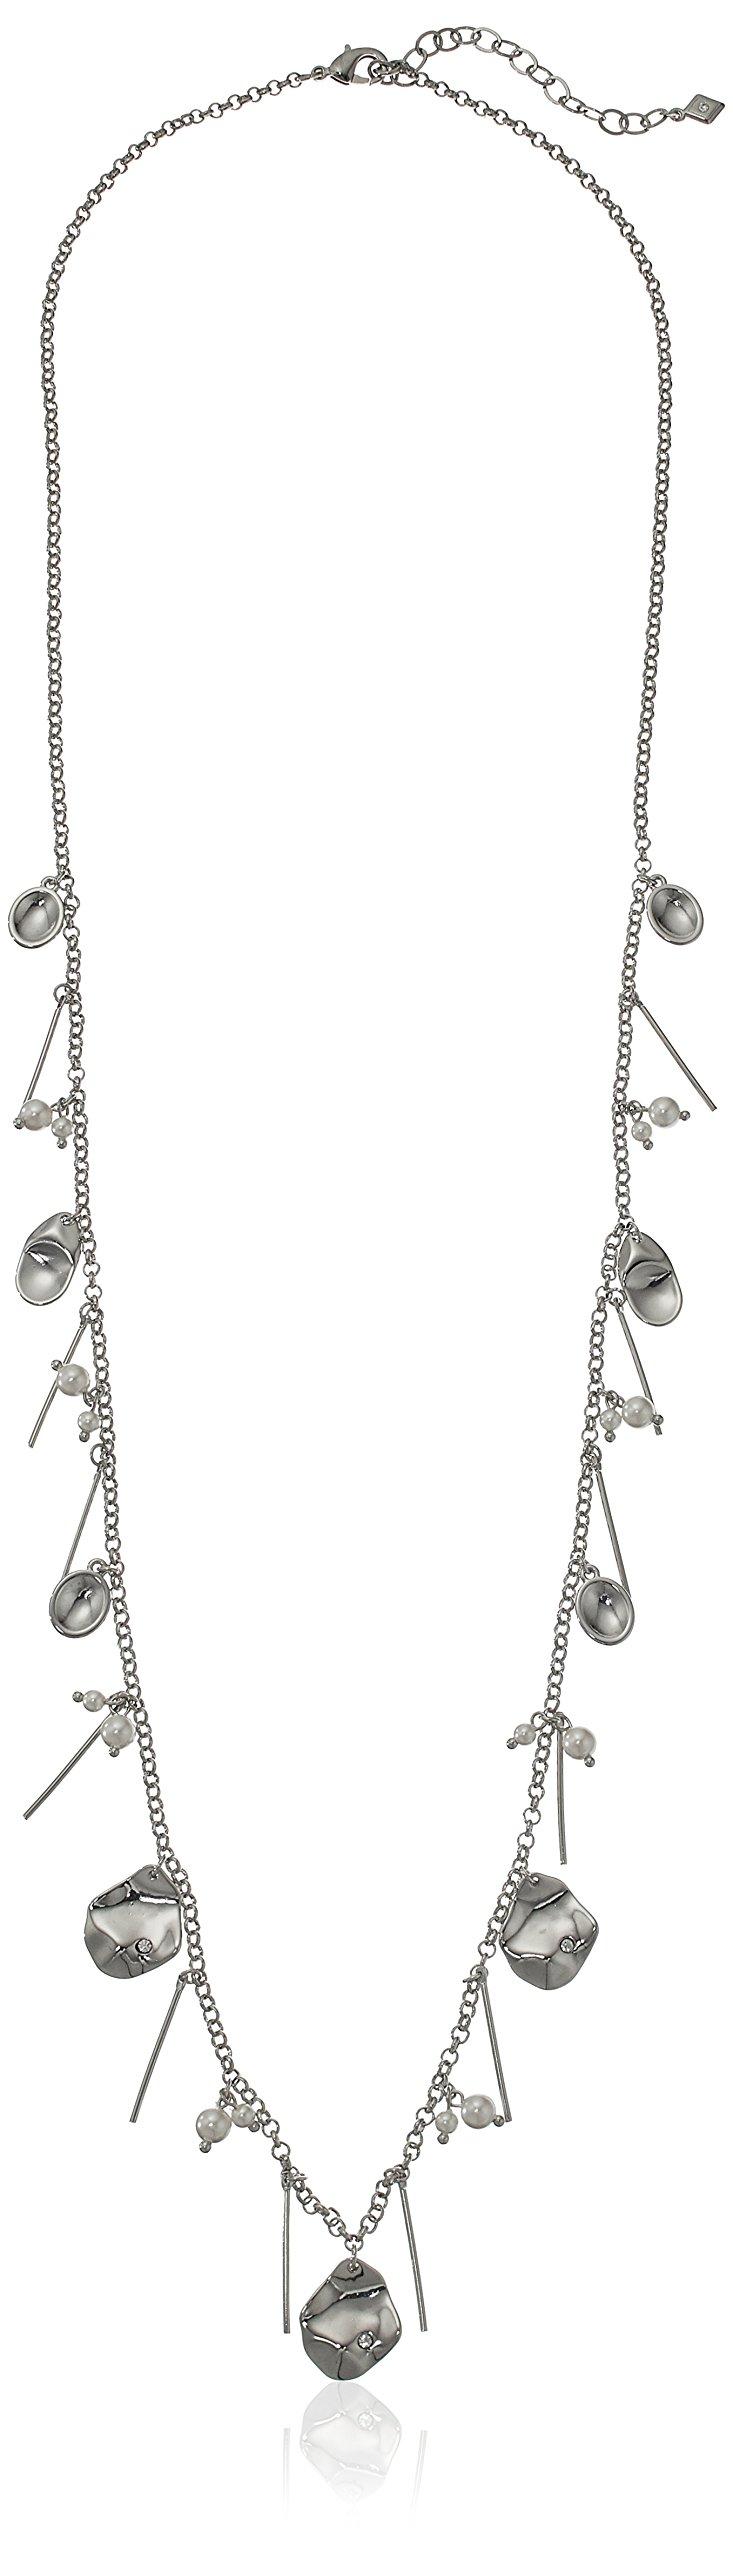 Vera Bradley Petals Cluster Strand Necklace in Silver Tone